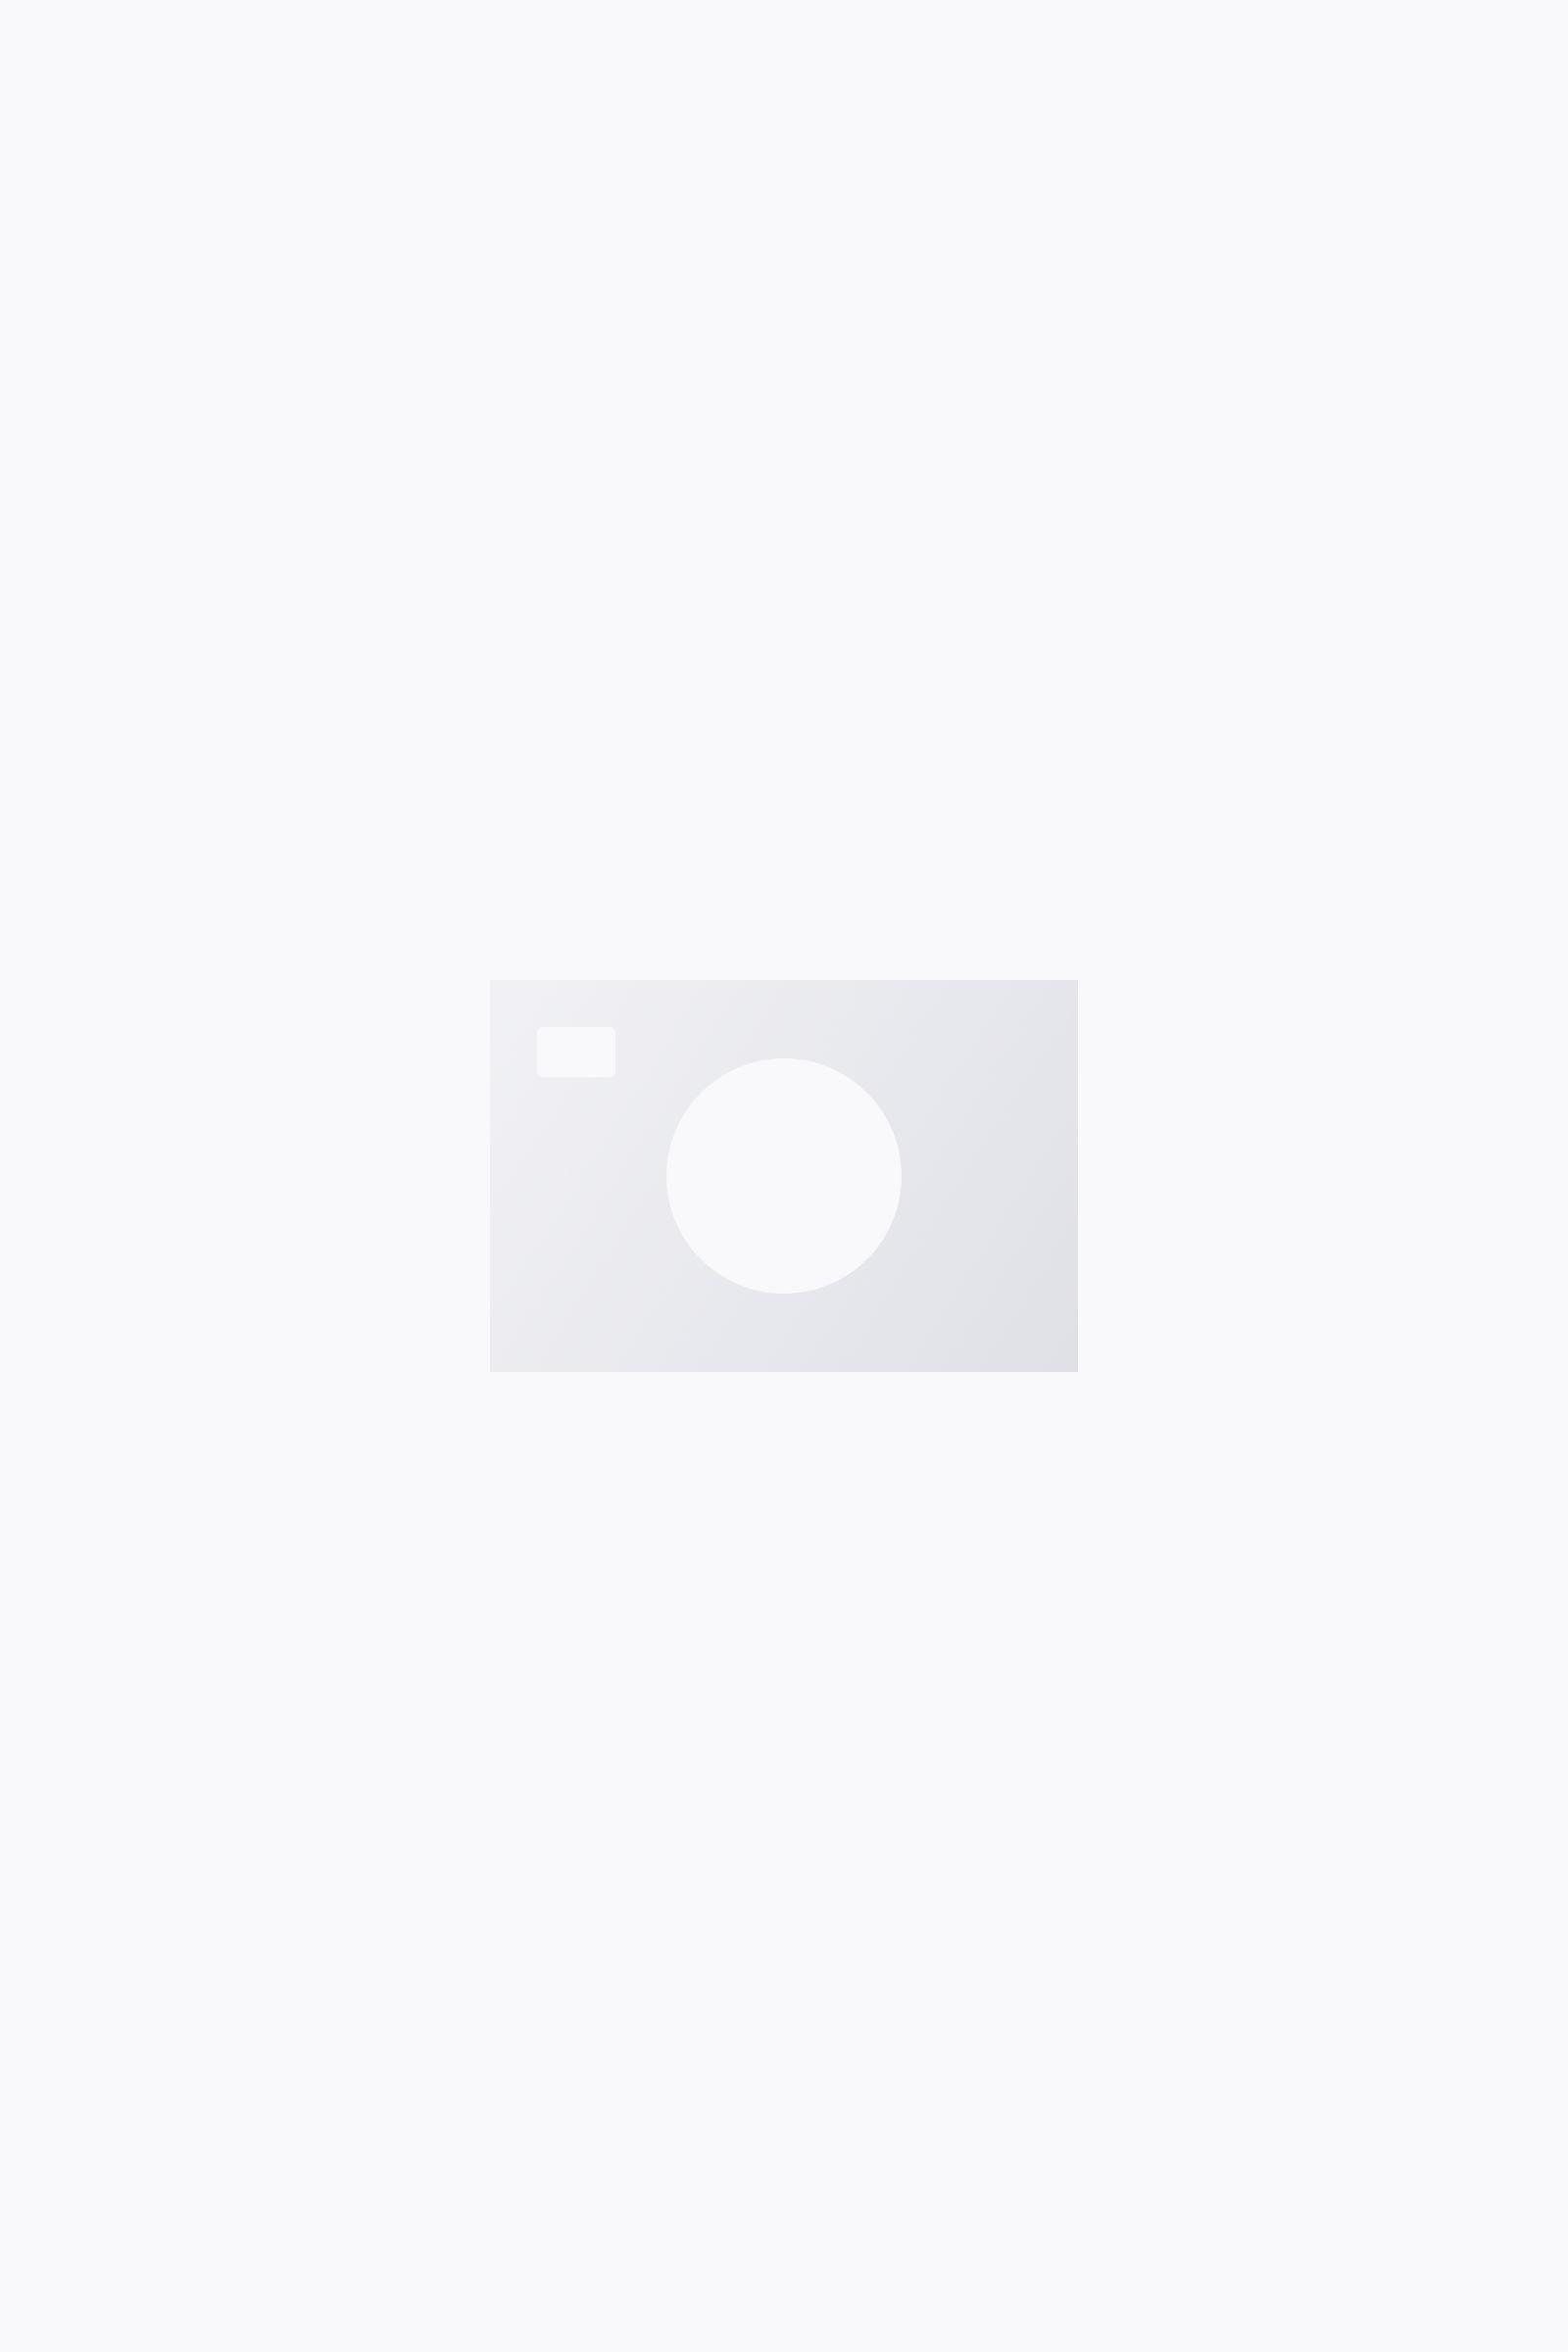 COS REGULAR-FIT BRUSHED COTTON T-SHIRT,White